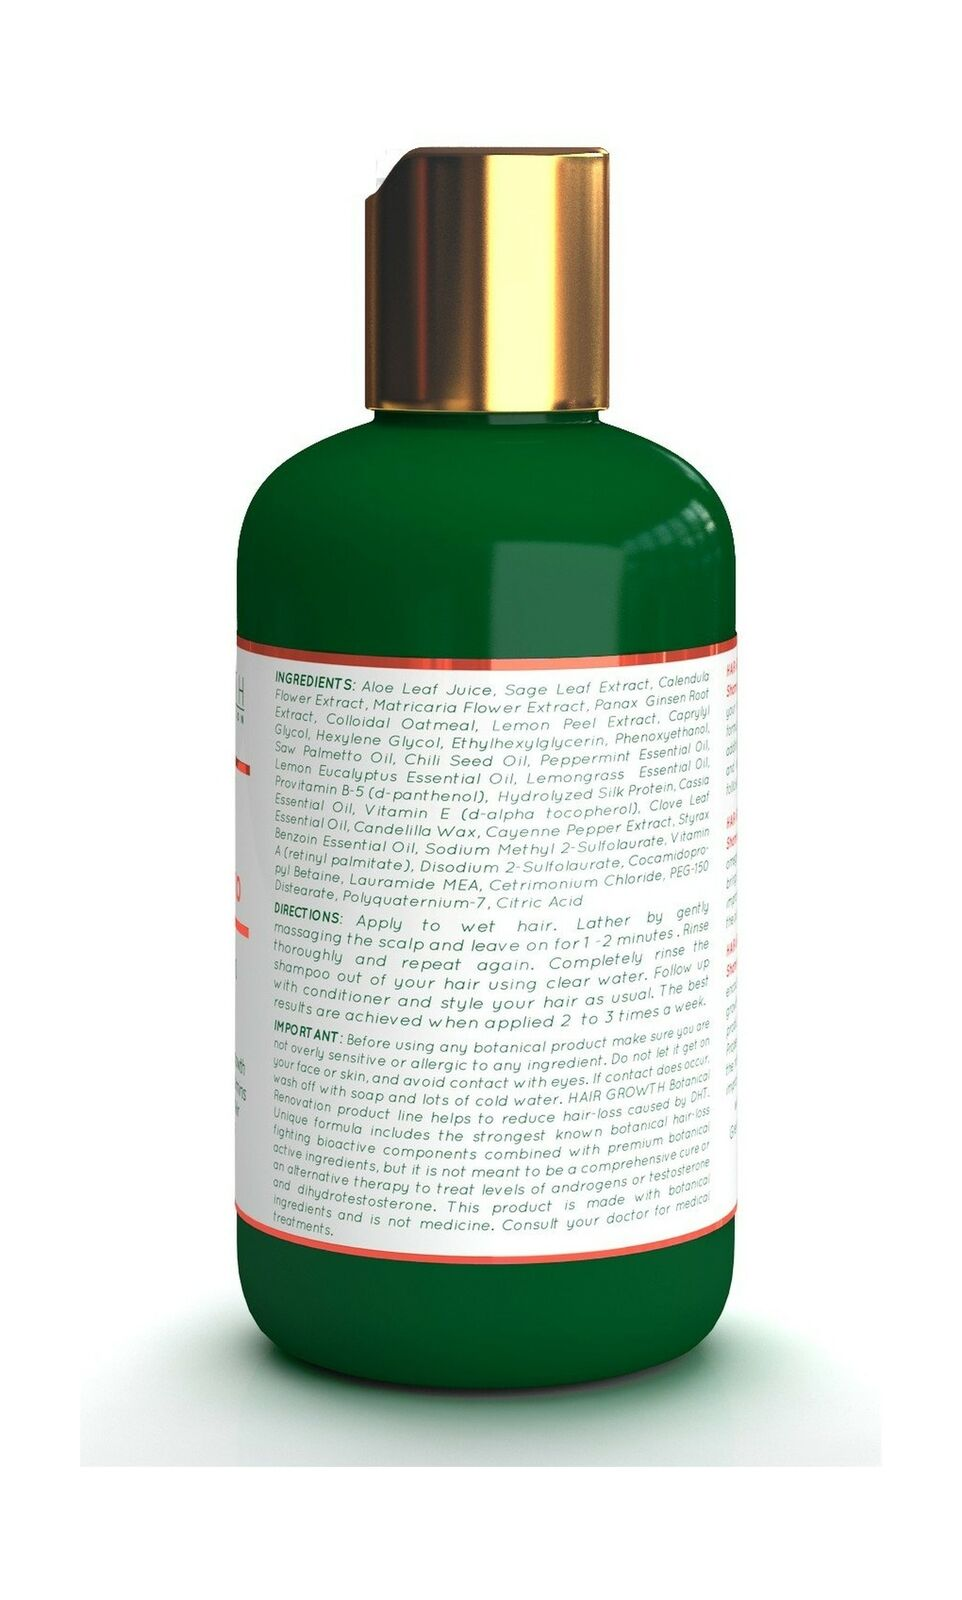 Hair Growth Cayenne Saw Palmetto Scalp Stimulating Botanical Shampoo  Original